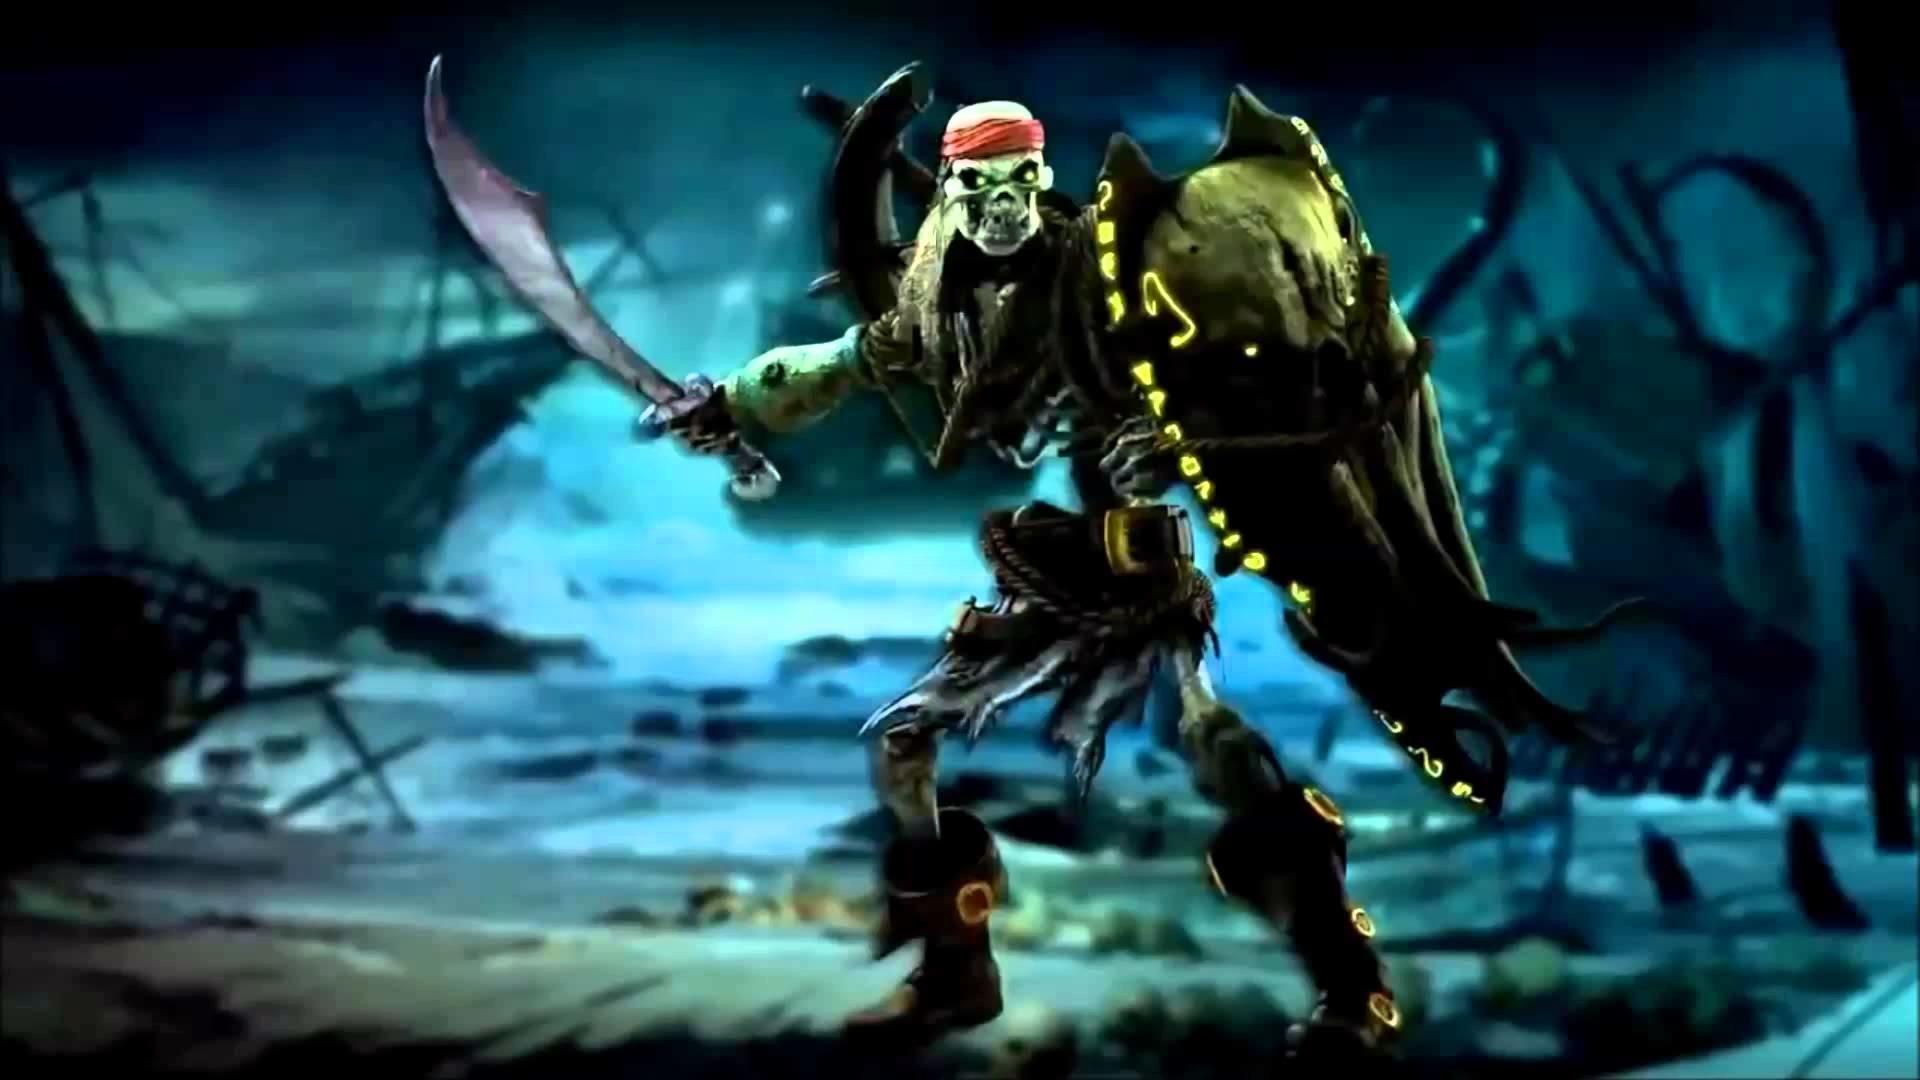 Killer Instinct XboxOne Spinal Theme (Full Version) Soundtrack – YouTube